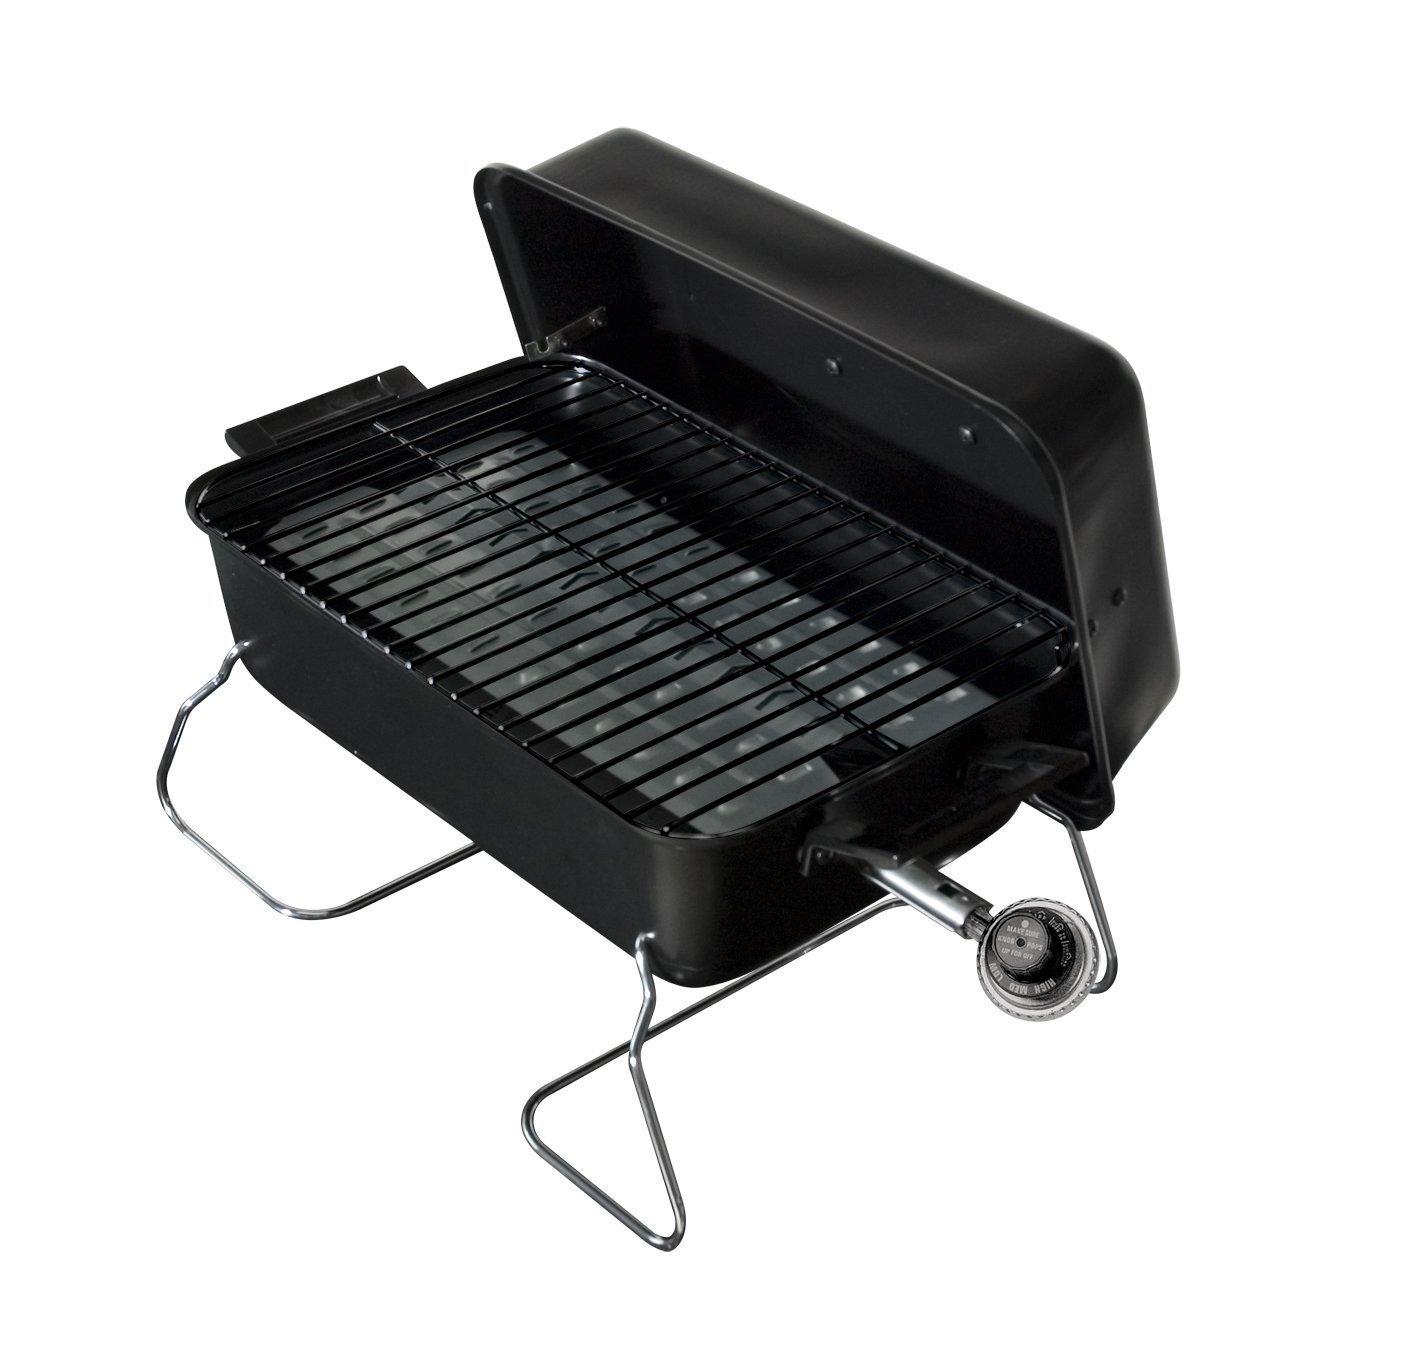 Char-Broil 465133010 Table Top 11,000 BTU 190 Sq. Inch Portable Gas Grill